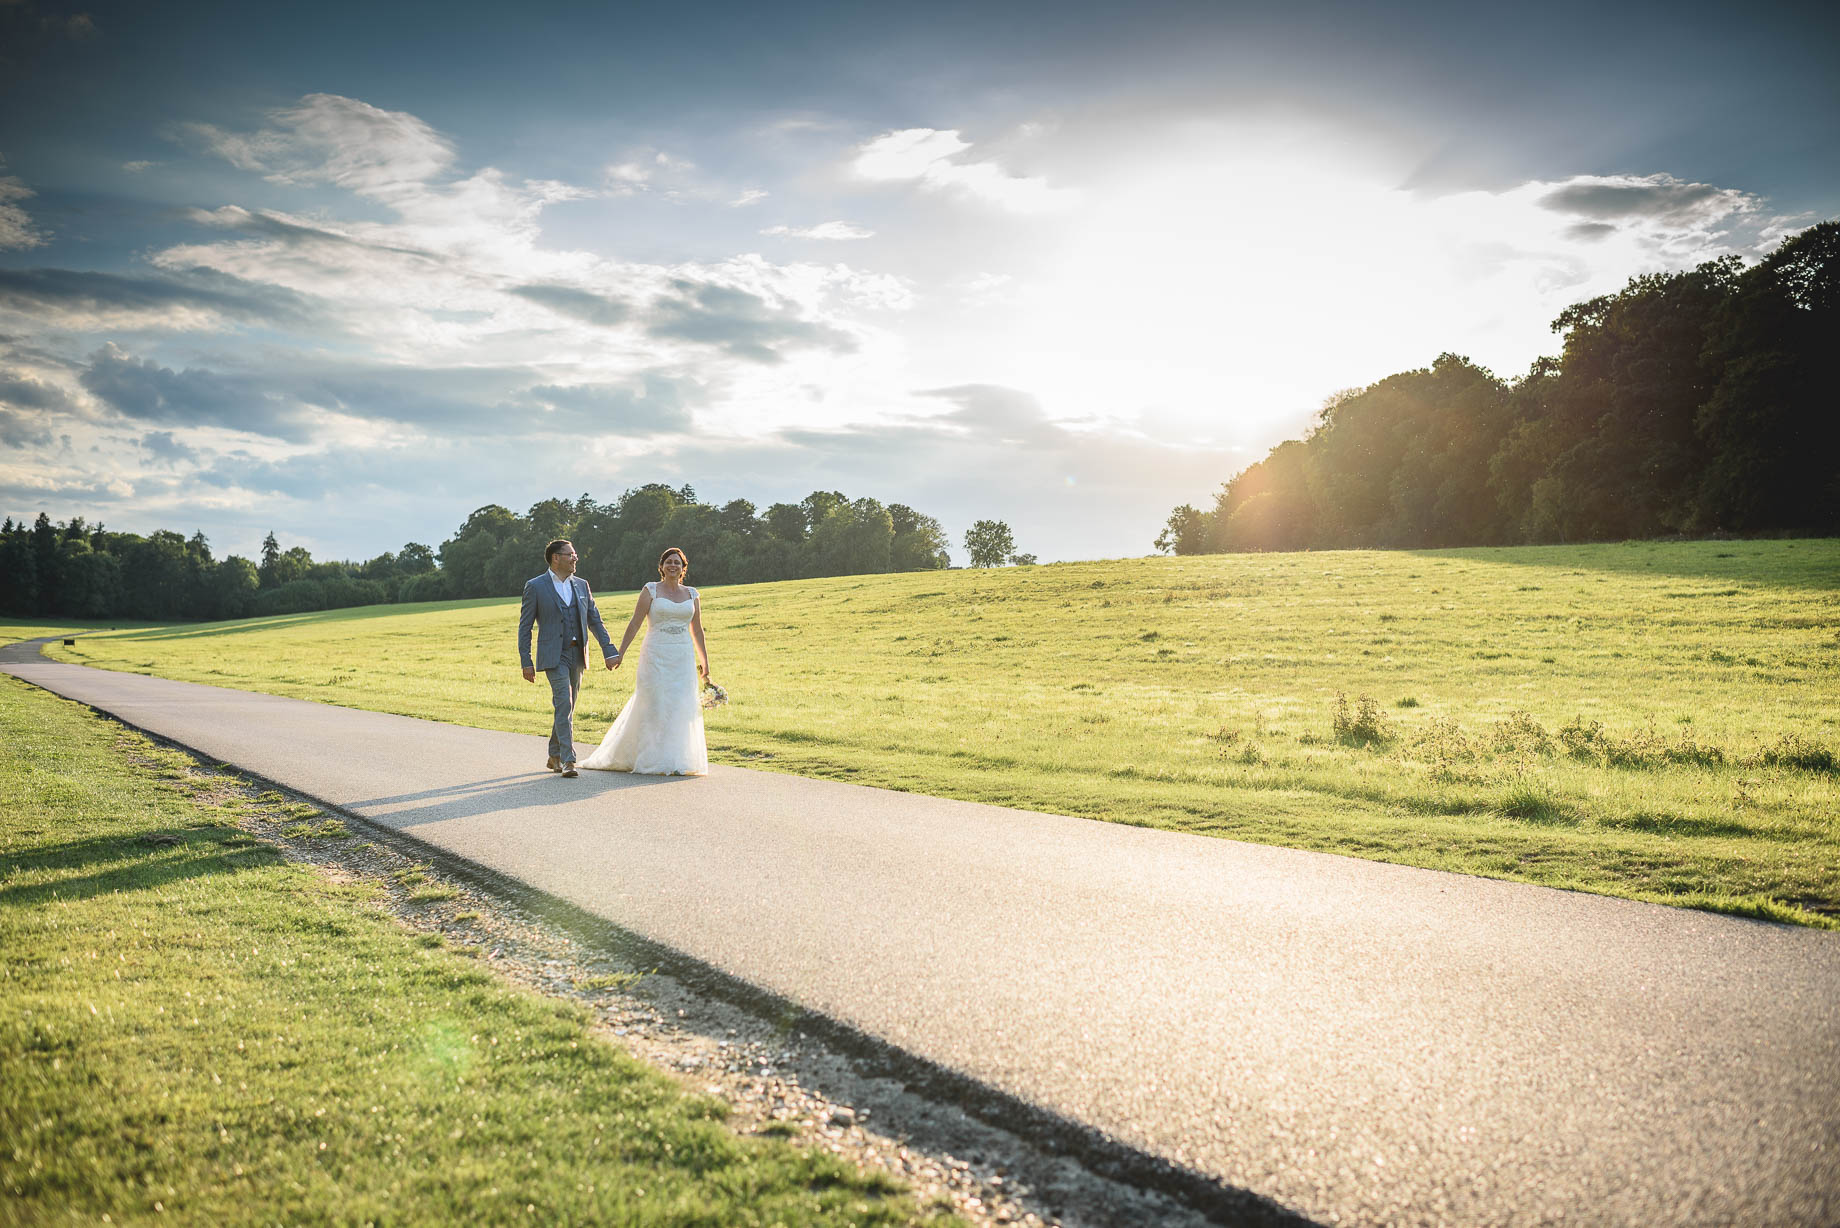 Luton Hoo wedding photography - Lauren + Gem